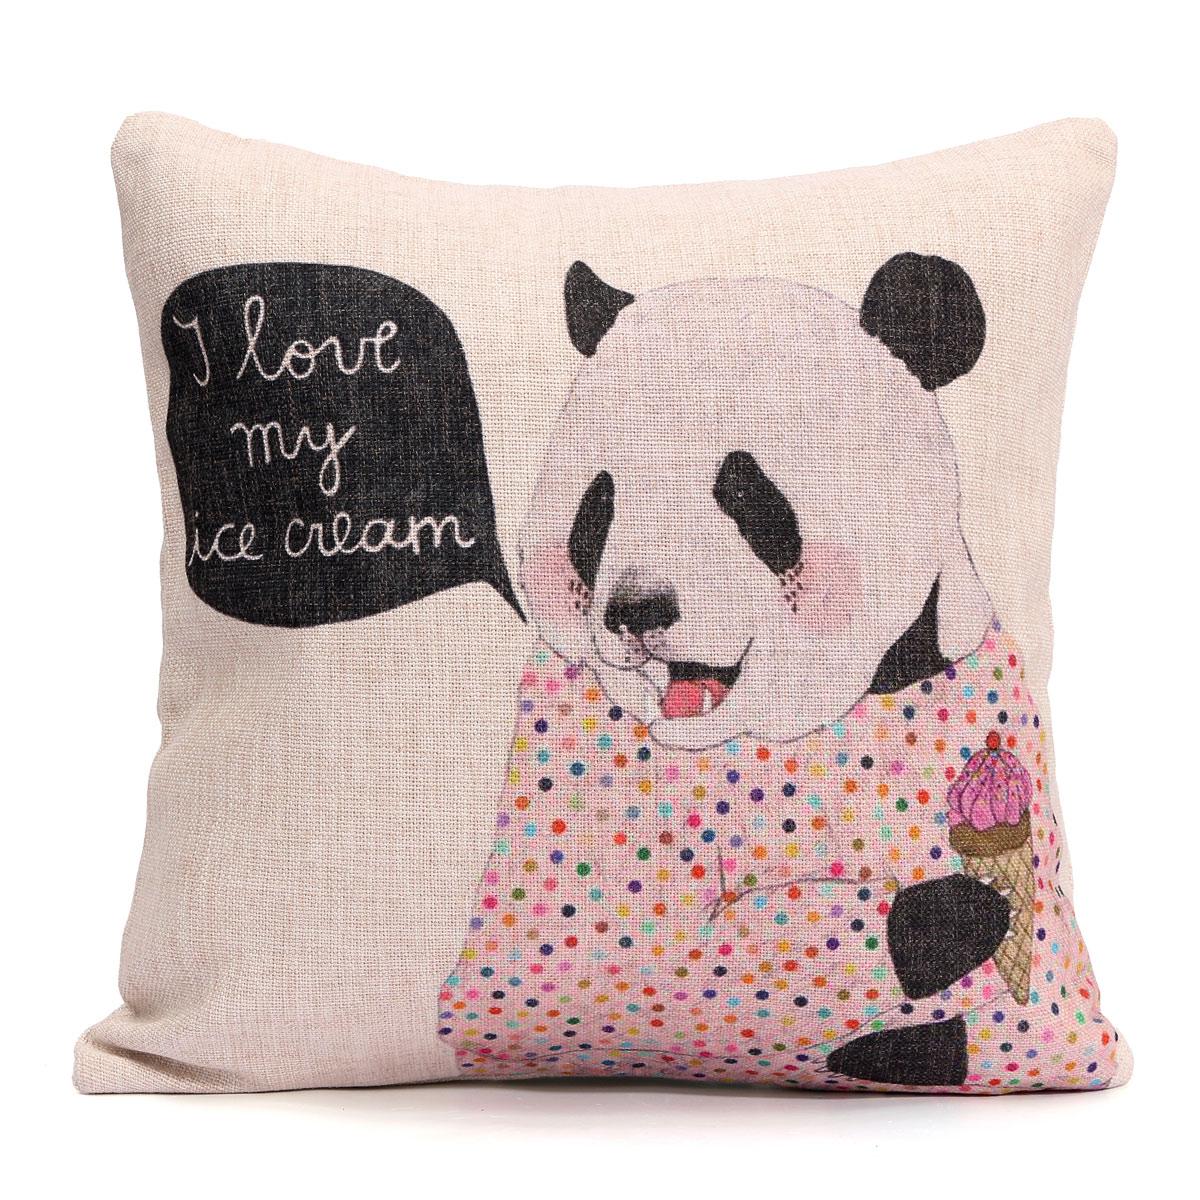 Chein chat animal housse de coussin canapé taie d'oreiller maison cushion cover